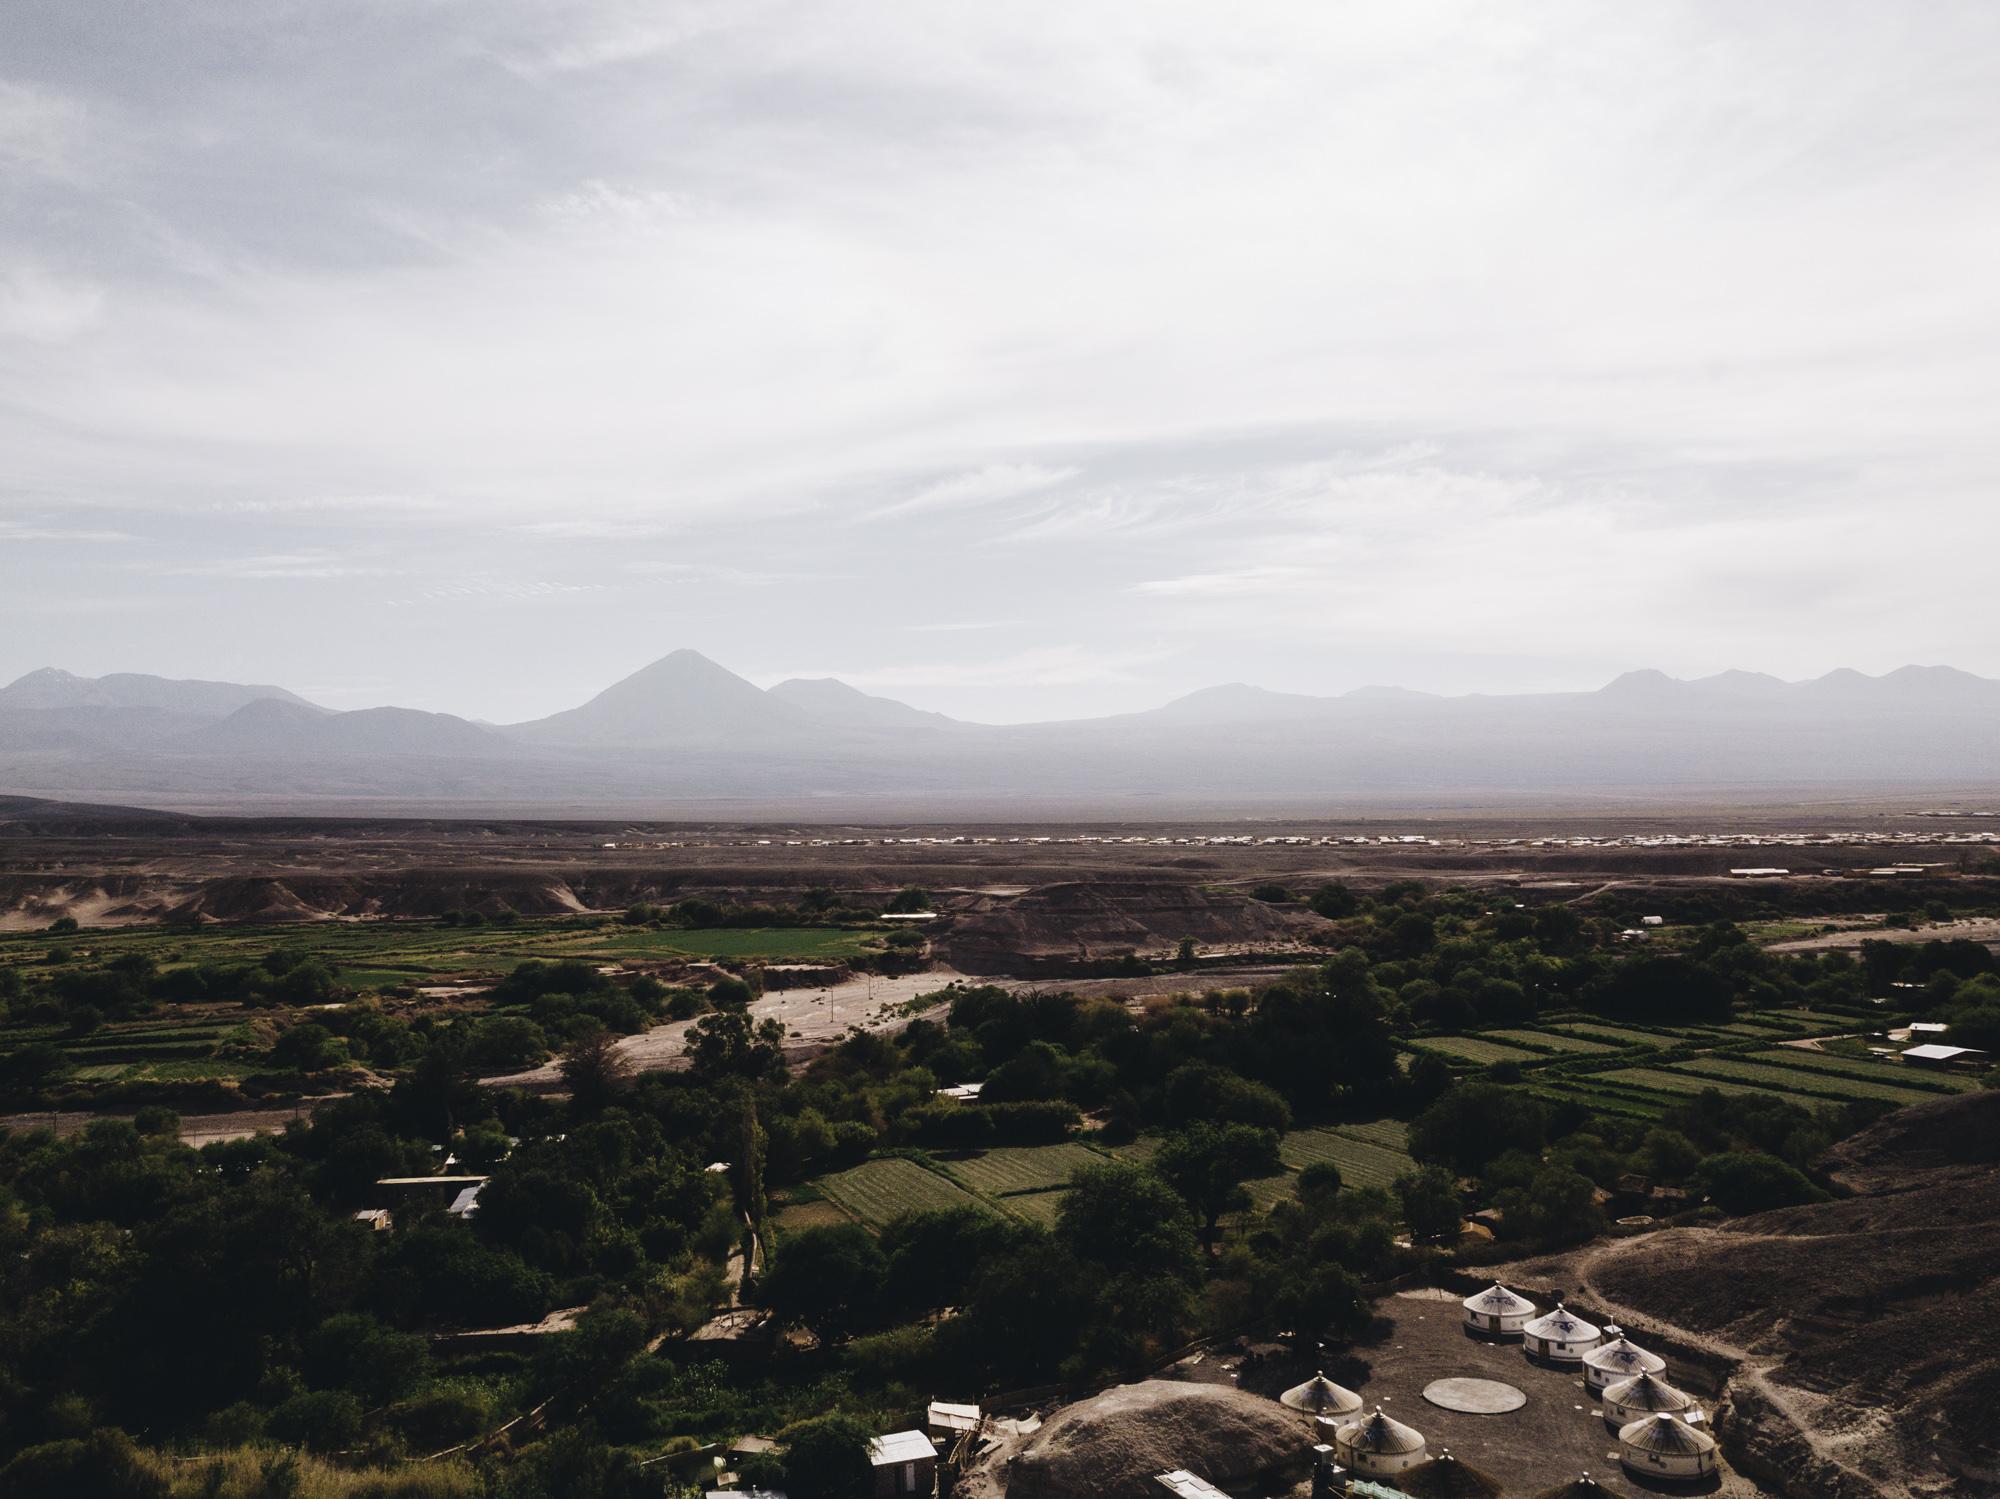 Mael Lambla photographer Chile San pedro atacama desert-10.jpg